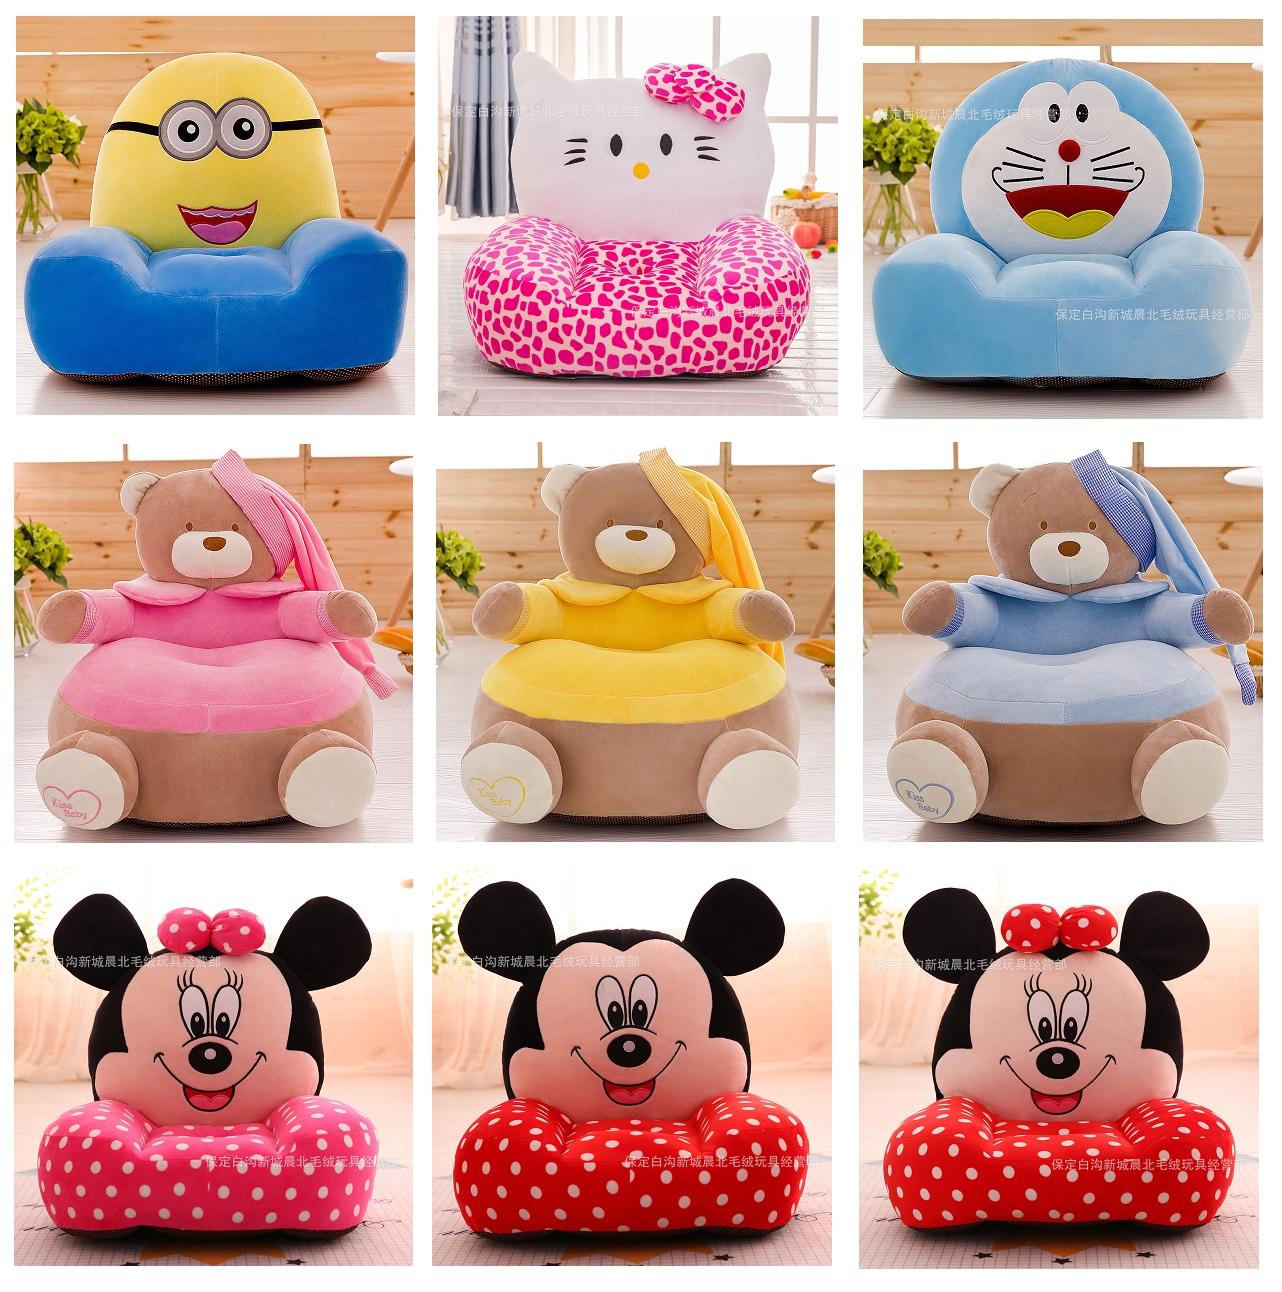 baby sofa seat , kids sofa , children sofa , kids seat , kids chair, Children , sofa , couch , seat ,chair , kids room decor , in pakistan